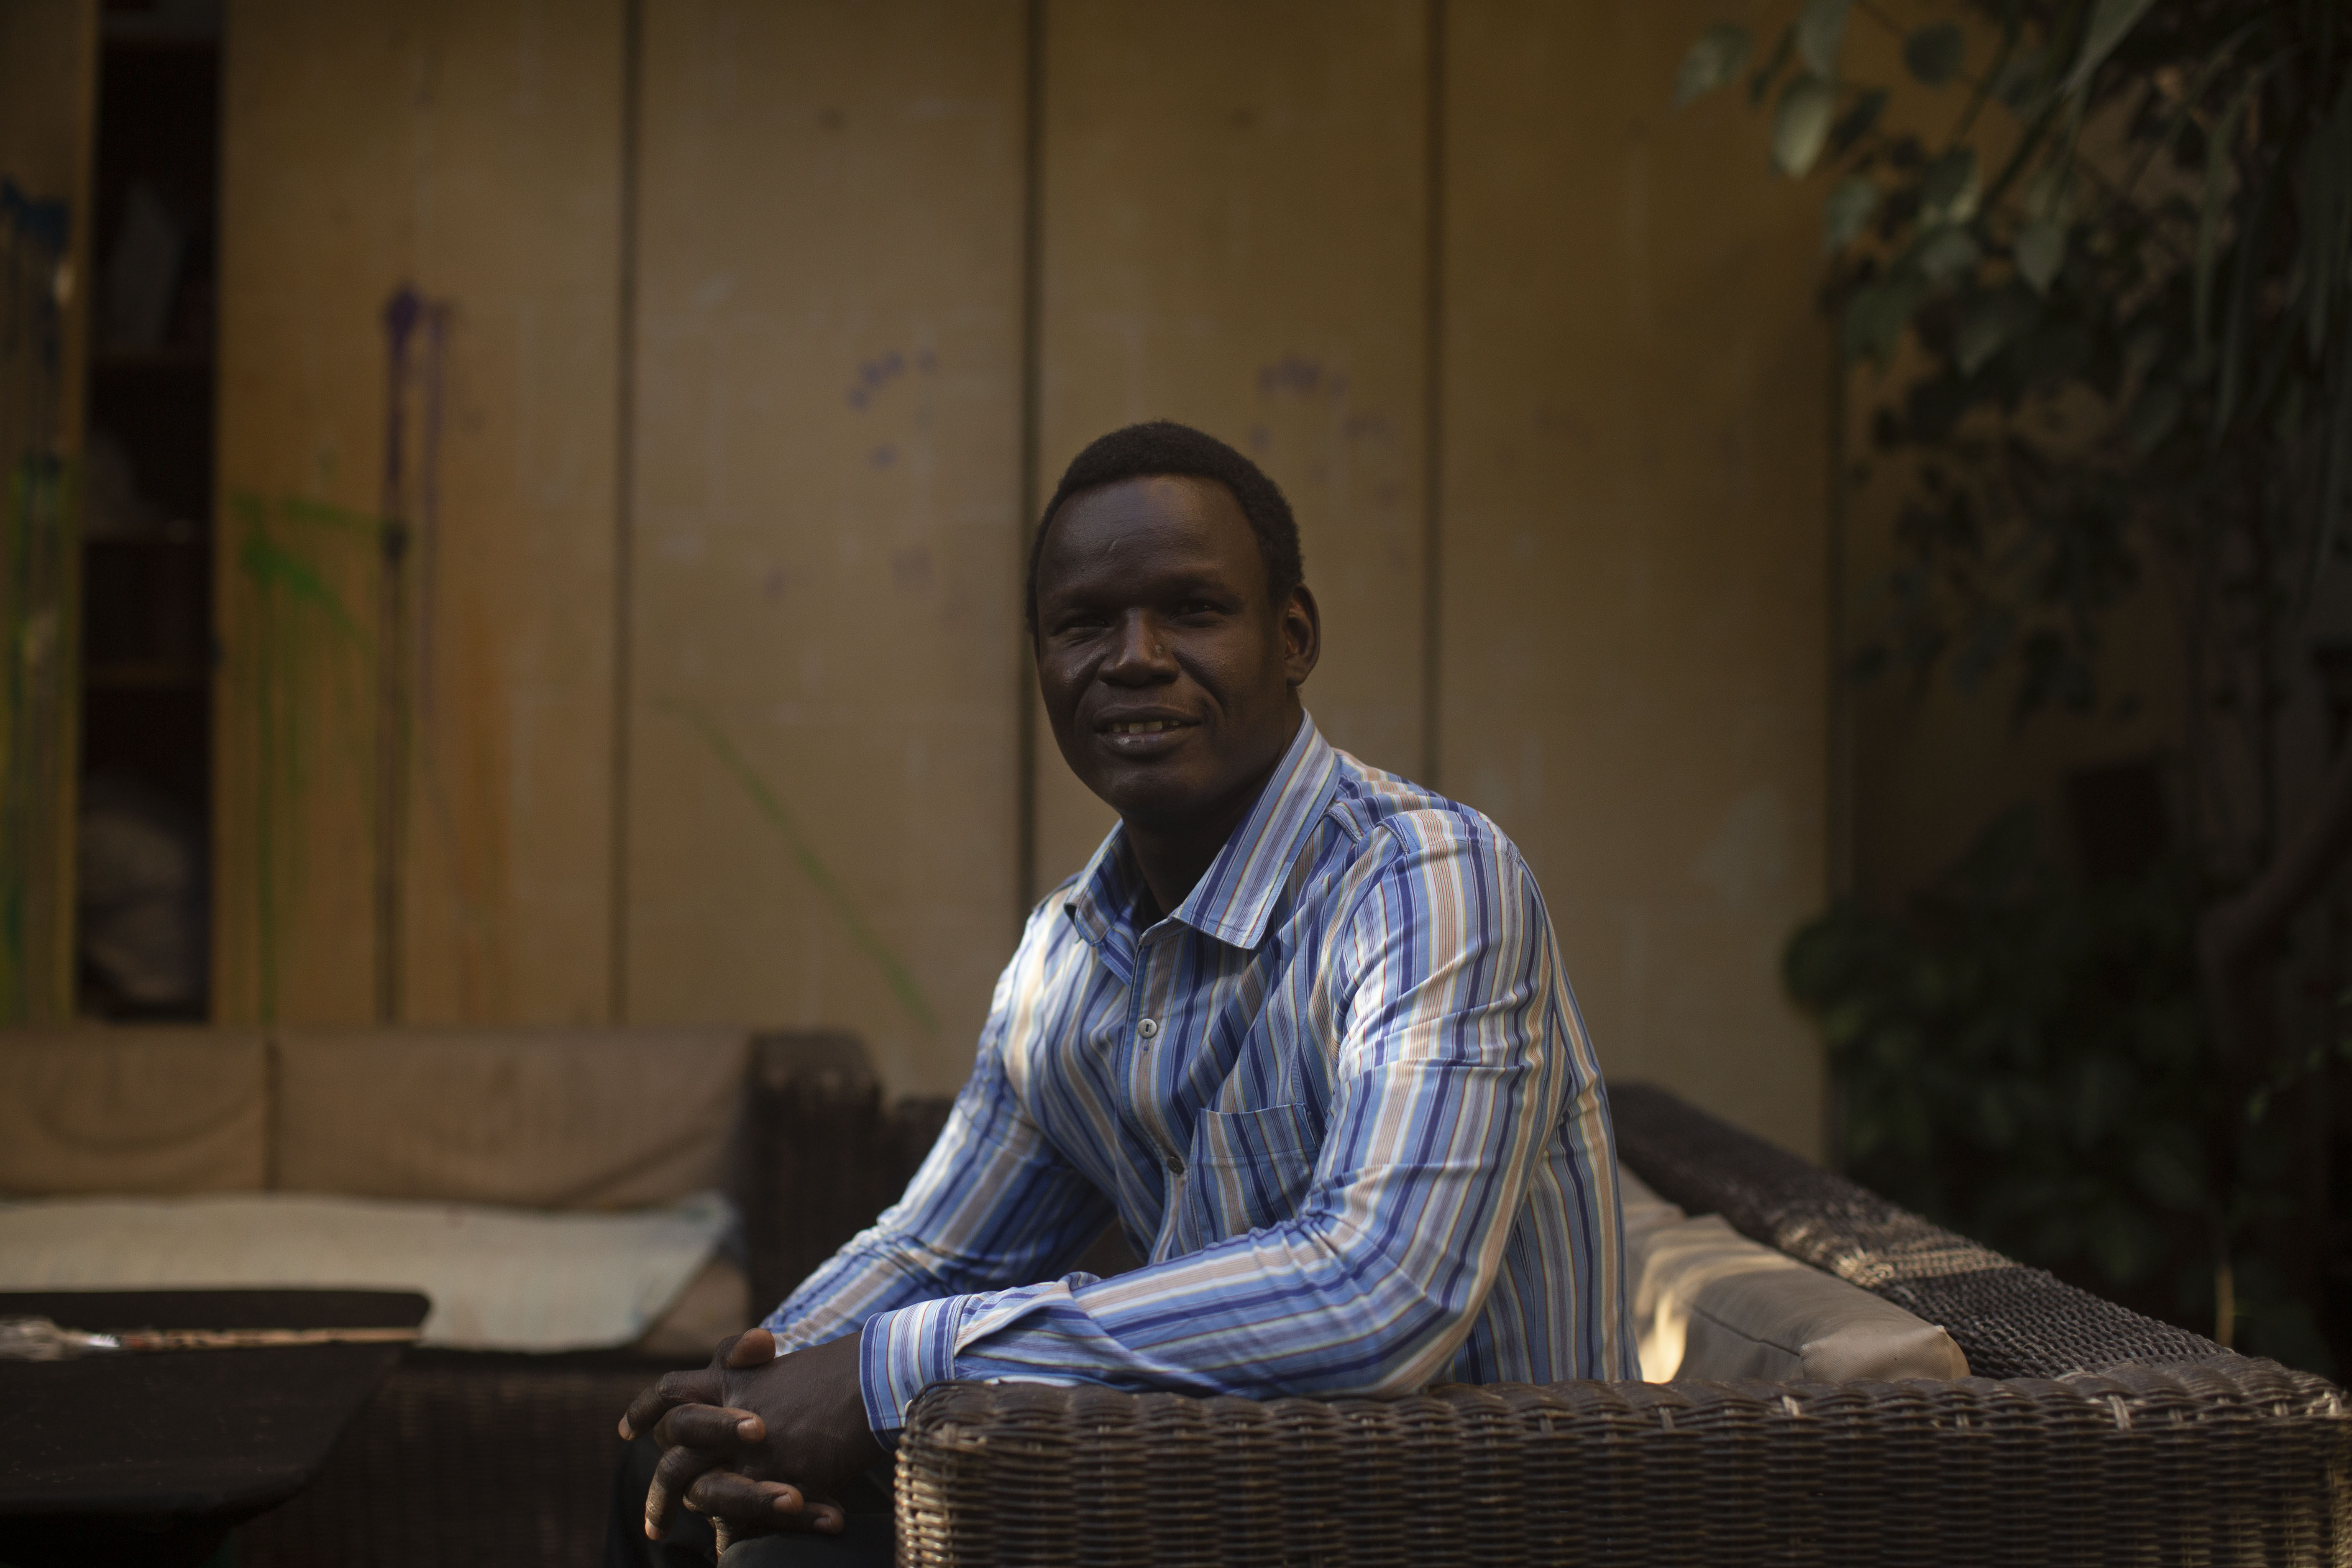 Fleeing war, poverty, African migrants face racism in Egypt